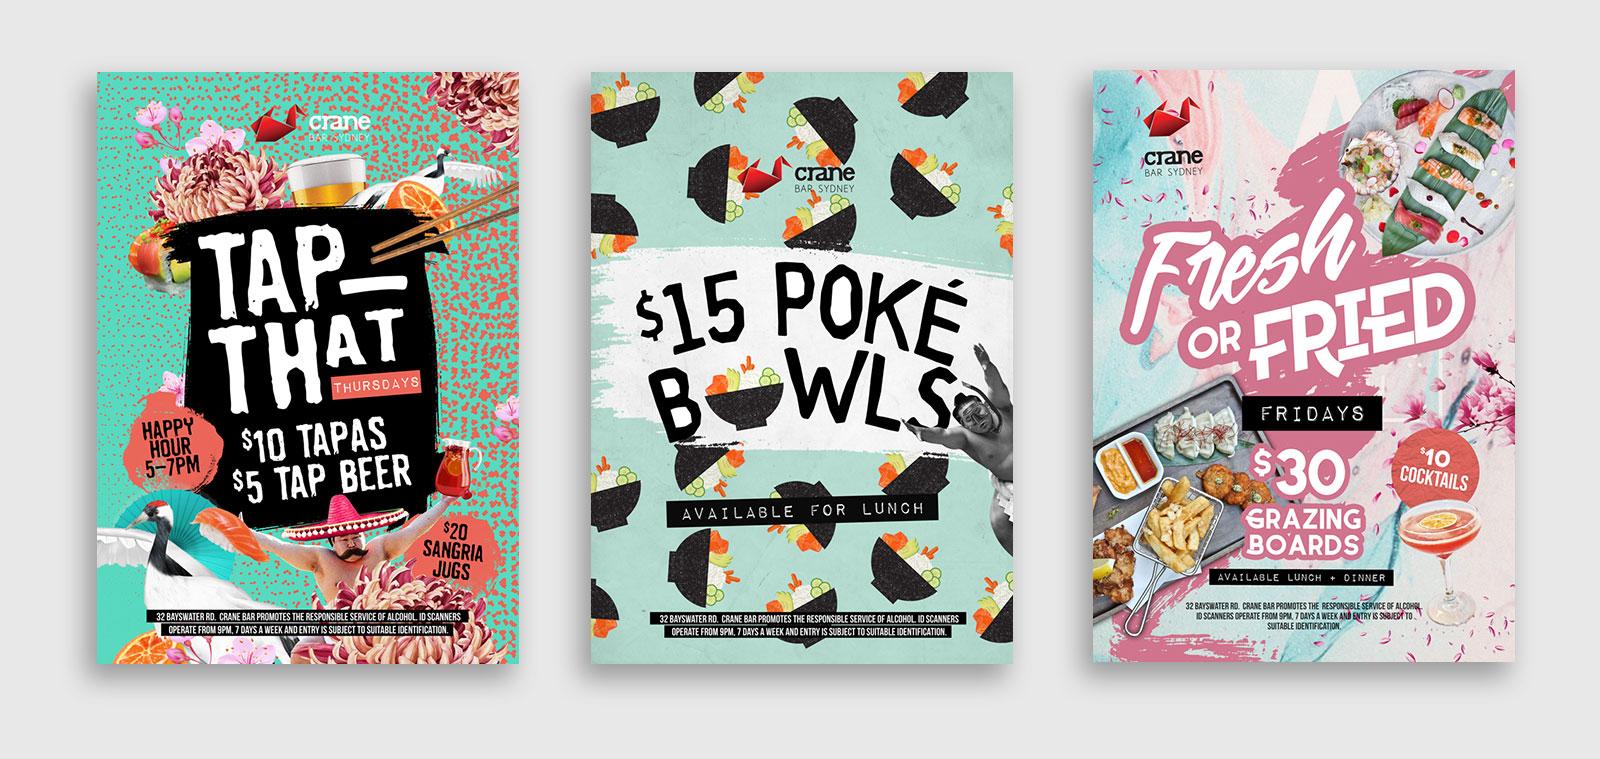 Graphic Design agency Three poster designs for Crane Bar